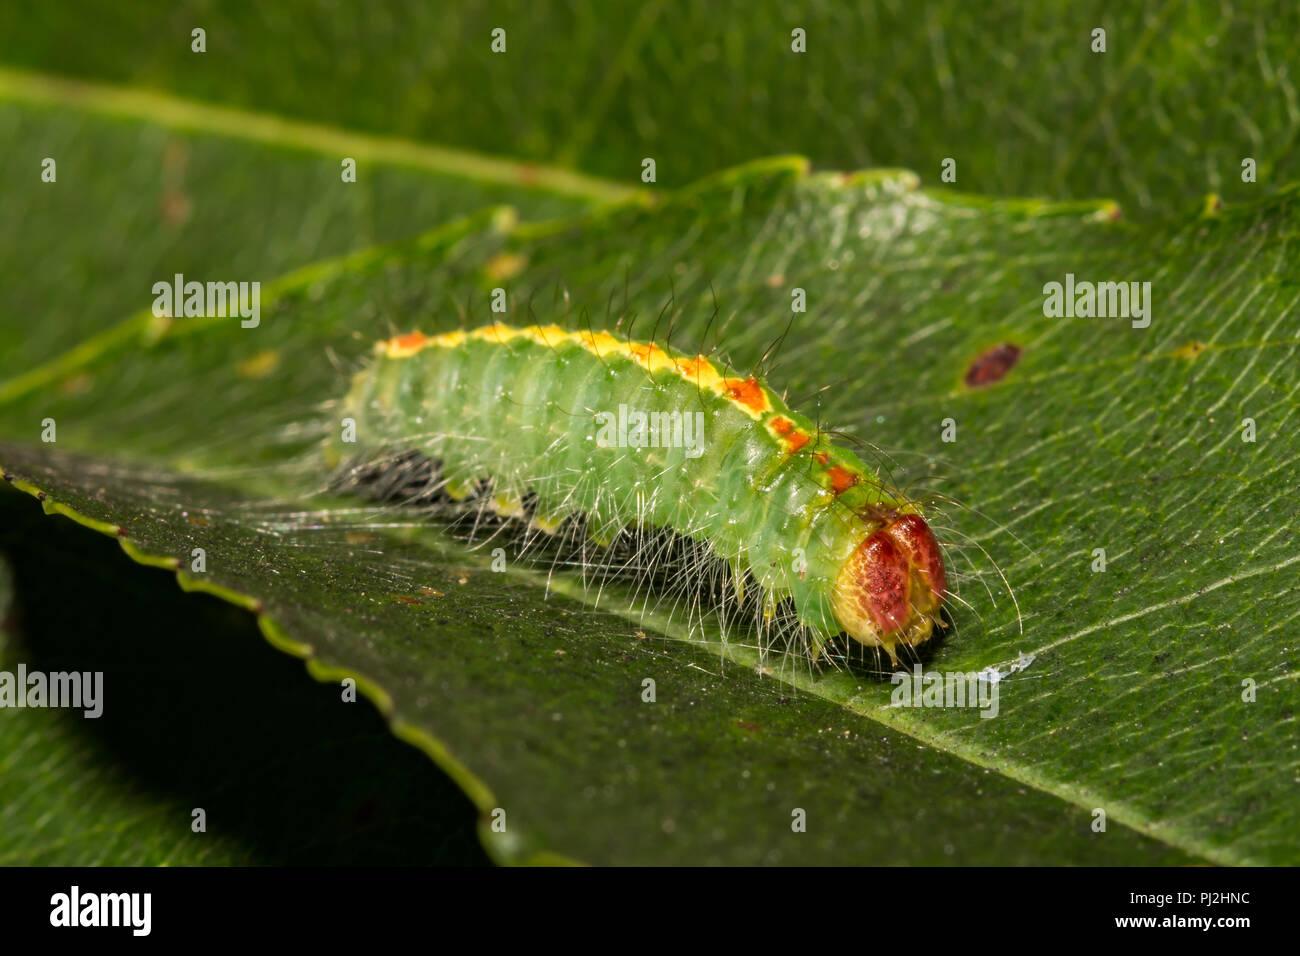 Cherry Dagger Moth Caterpillar (Acronicta hasta) - Stock Image